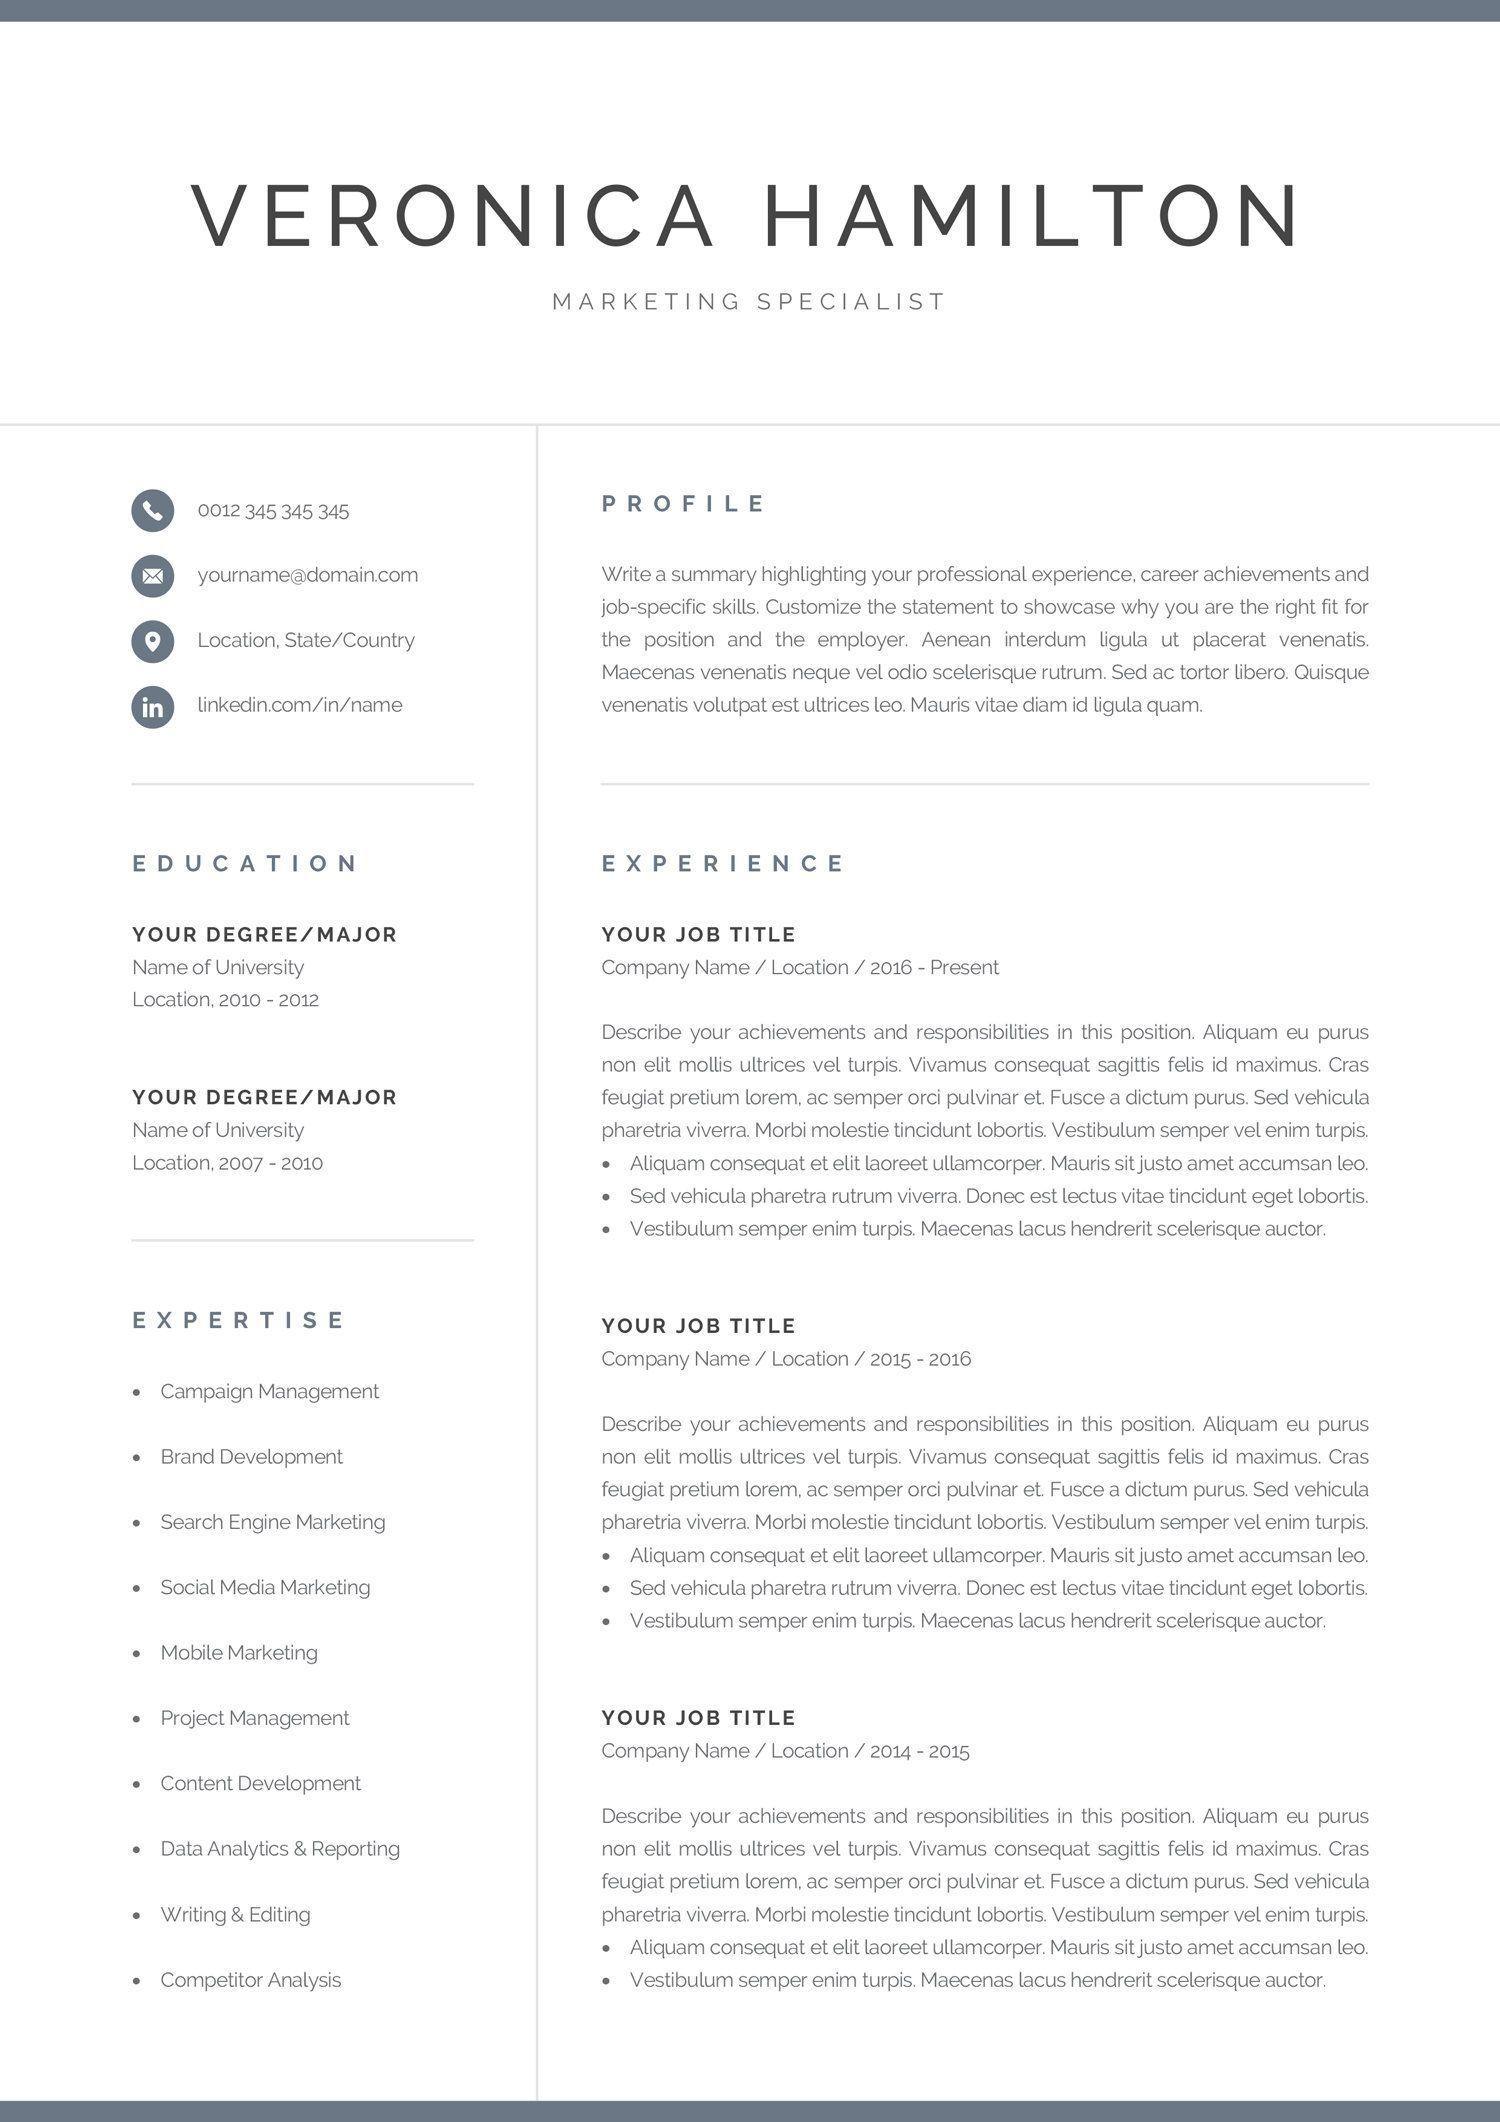 Pin By Arnav Digital On Resume Templates Free Resume Template Professional Marketing Resume Resume Examples